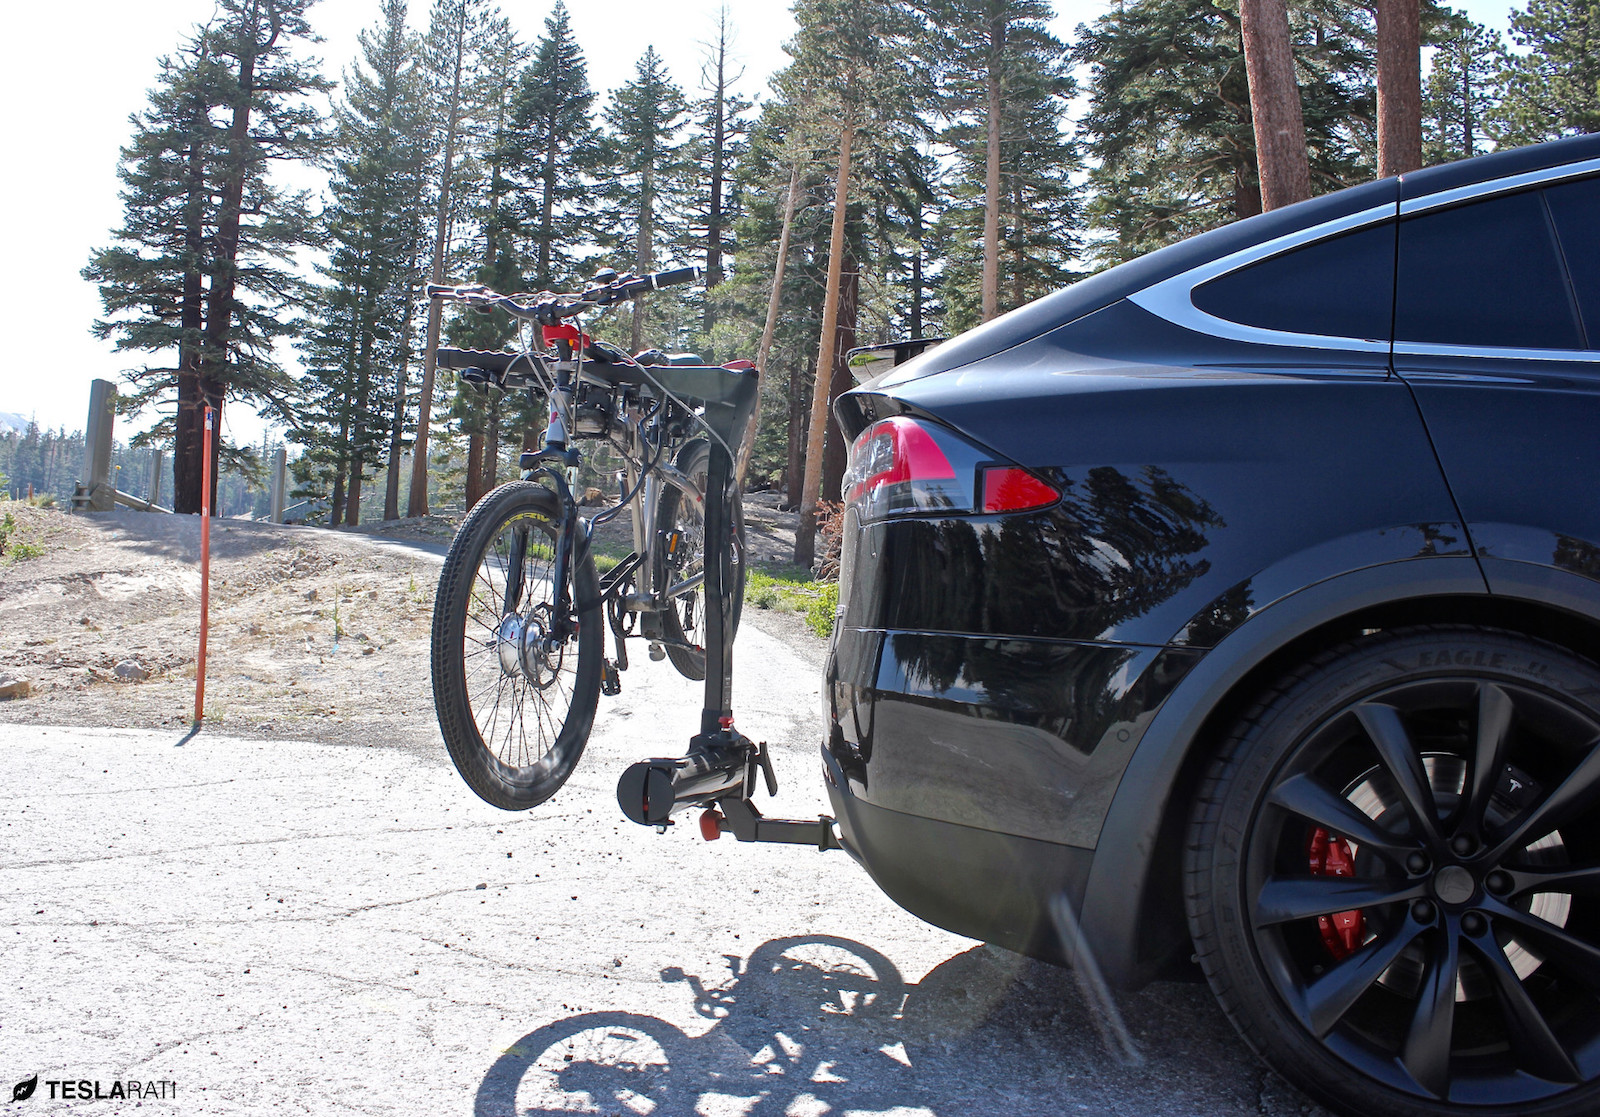 model-x-bike-rack-hitch-prodeco-1